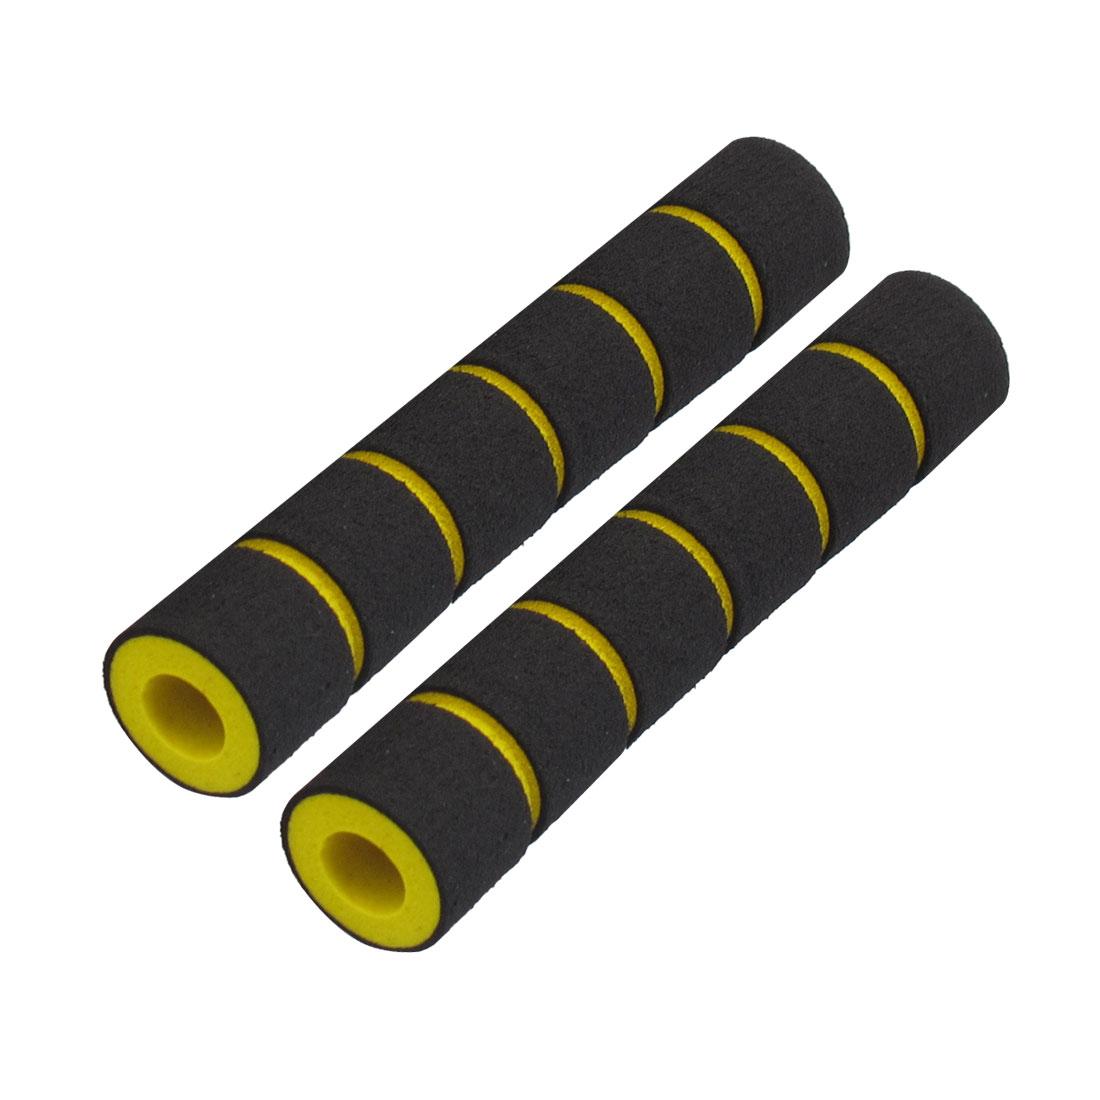 "2 Pcs 0.35"" Dia Striped Nonslip Cycling Bike Handlebar Grip Cover Black Yellow"